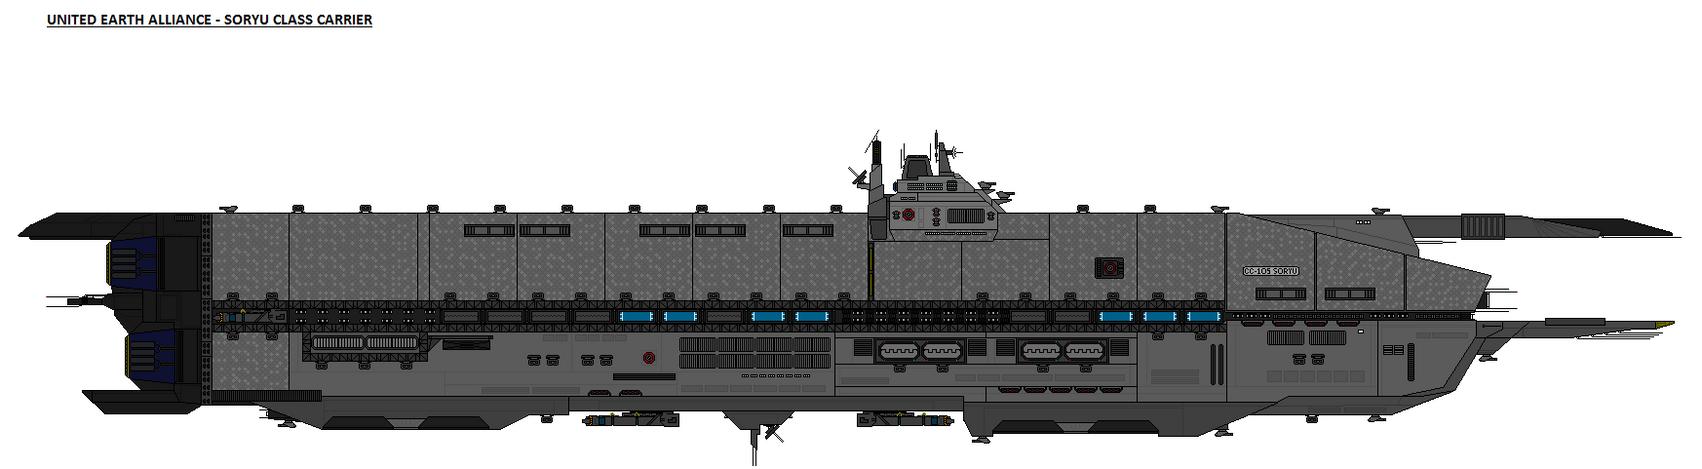 ftl drones with Soryu Class Carrier 517361957 on Soryu Class Carrier 517361957 in addition Crystal Ships in addition Soryu Class Carrier 517361957 besides Ninos also Test Risk Of Rain SU3050223990t.